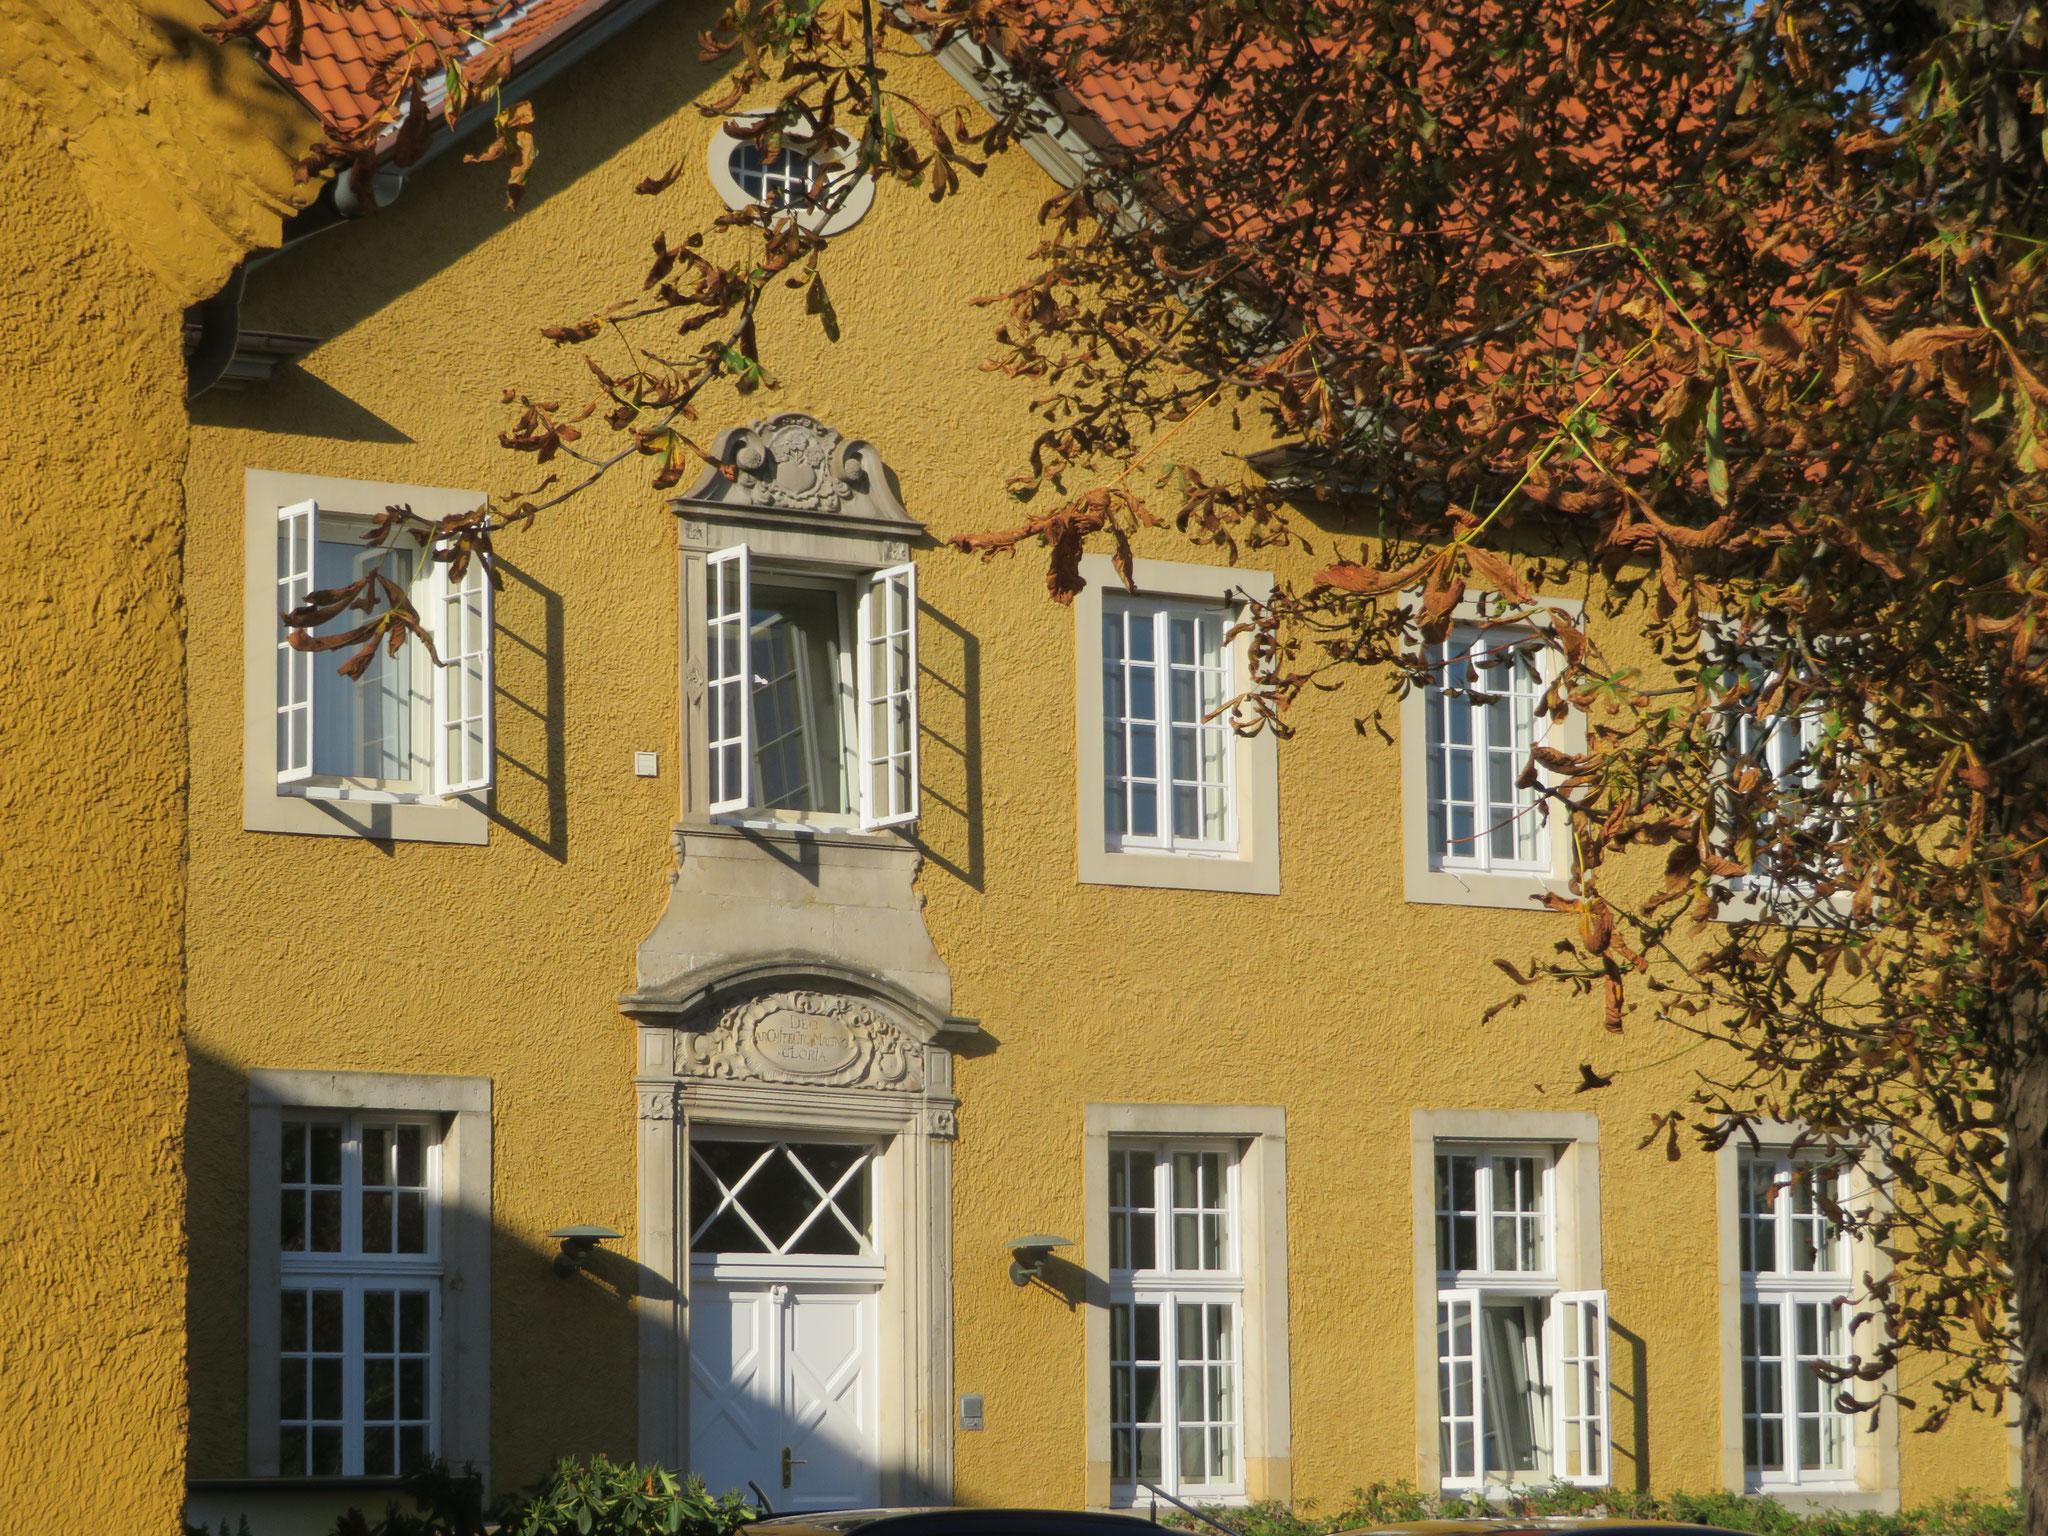 barokes Rathaus von Hilter am Teutoburger Wald